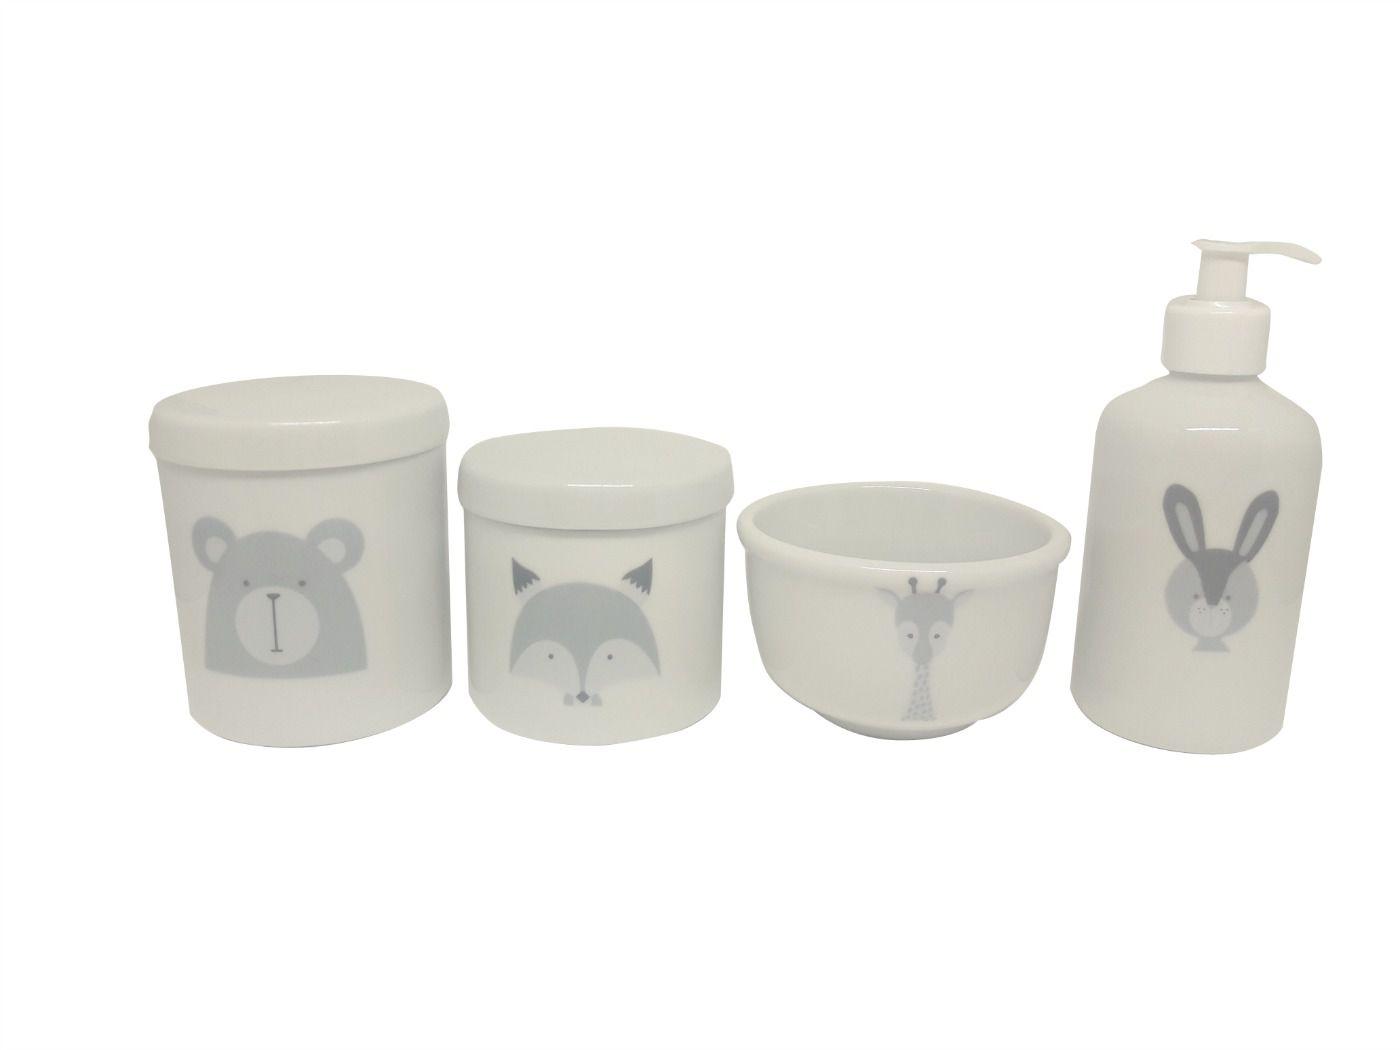 Kit Higiene Bebê Porcelana Escandinavo |Urso Raposa Coelho e Girafa